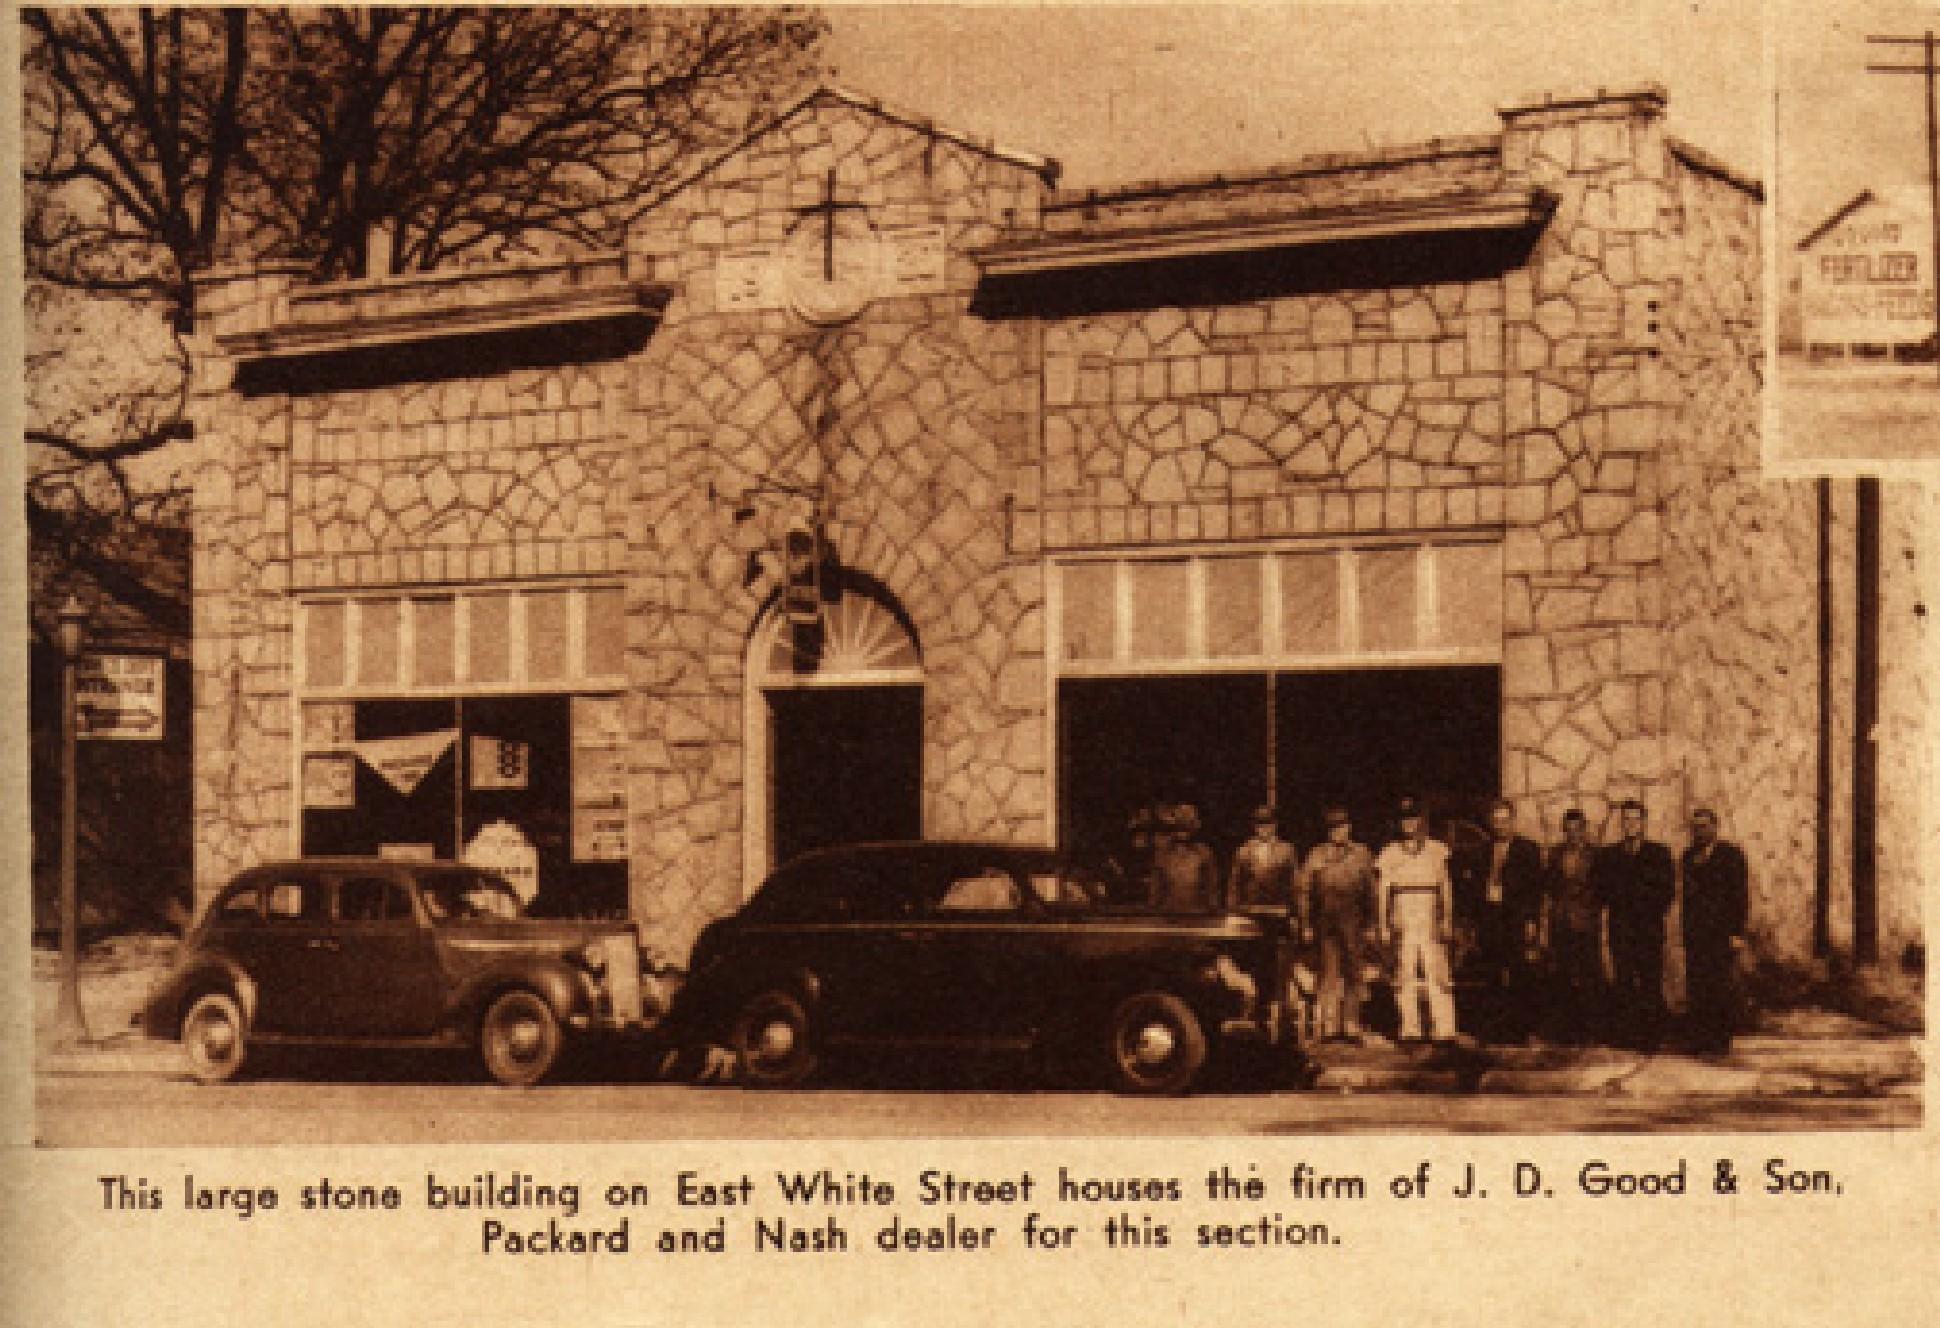 J.D. Good & Sons, Packard and Nash dealership 1939